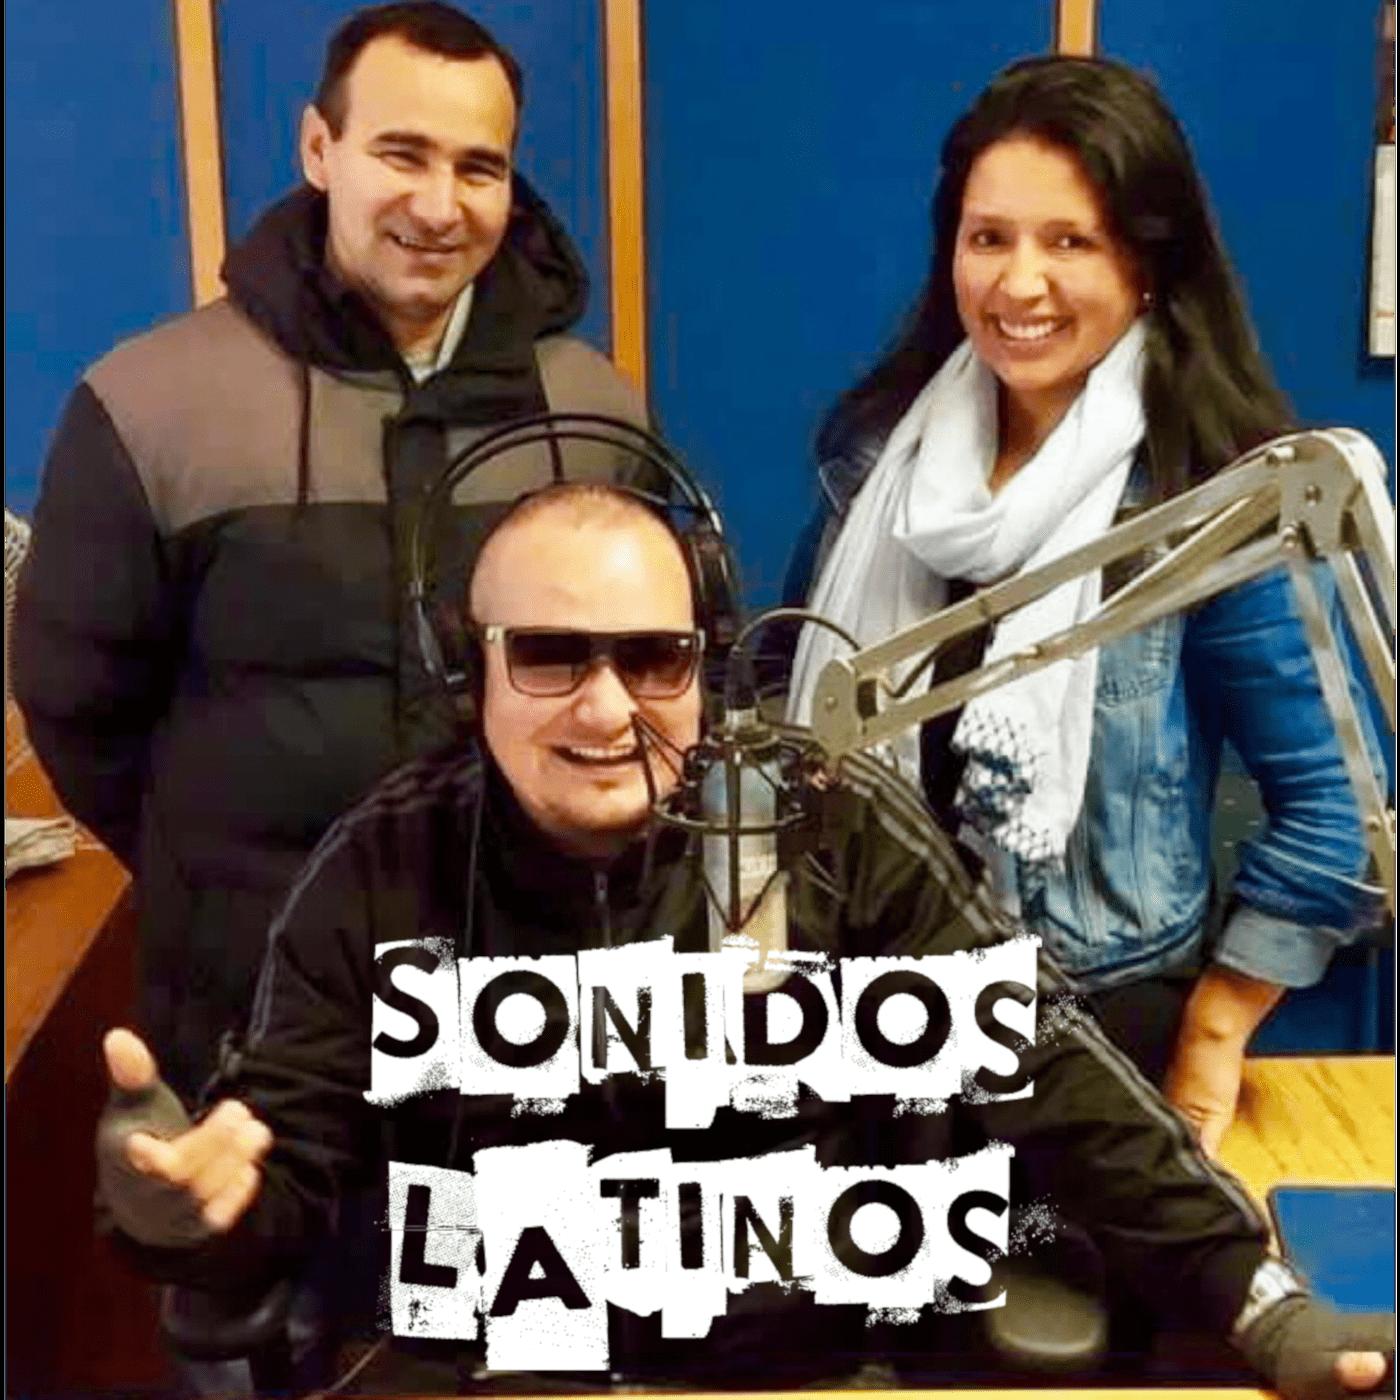 Sonidos Latinos - Adriana, Carlos, and Carolina-17-12-2018